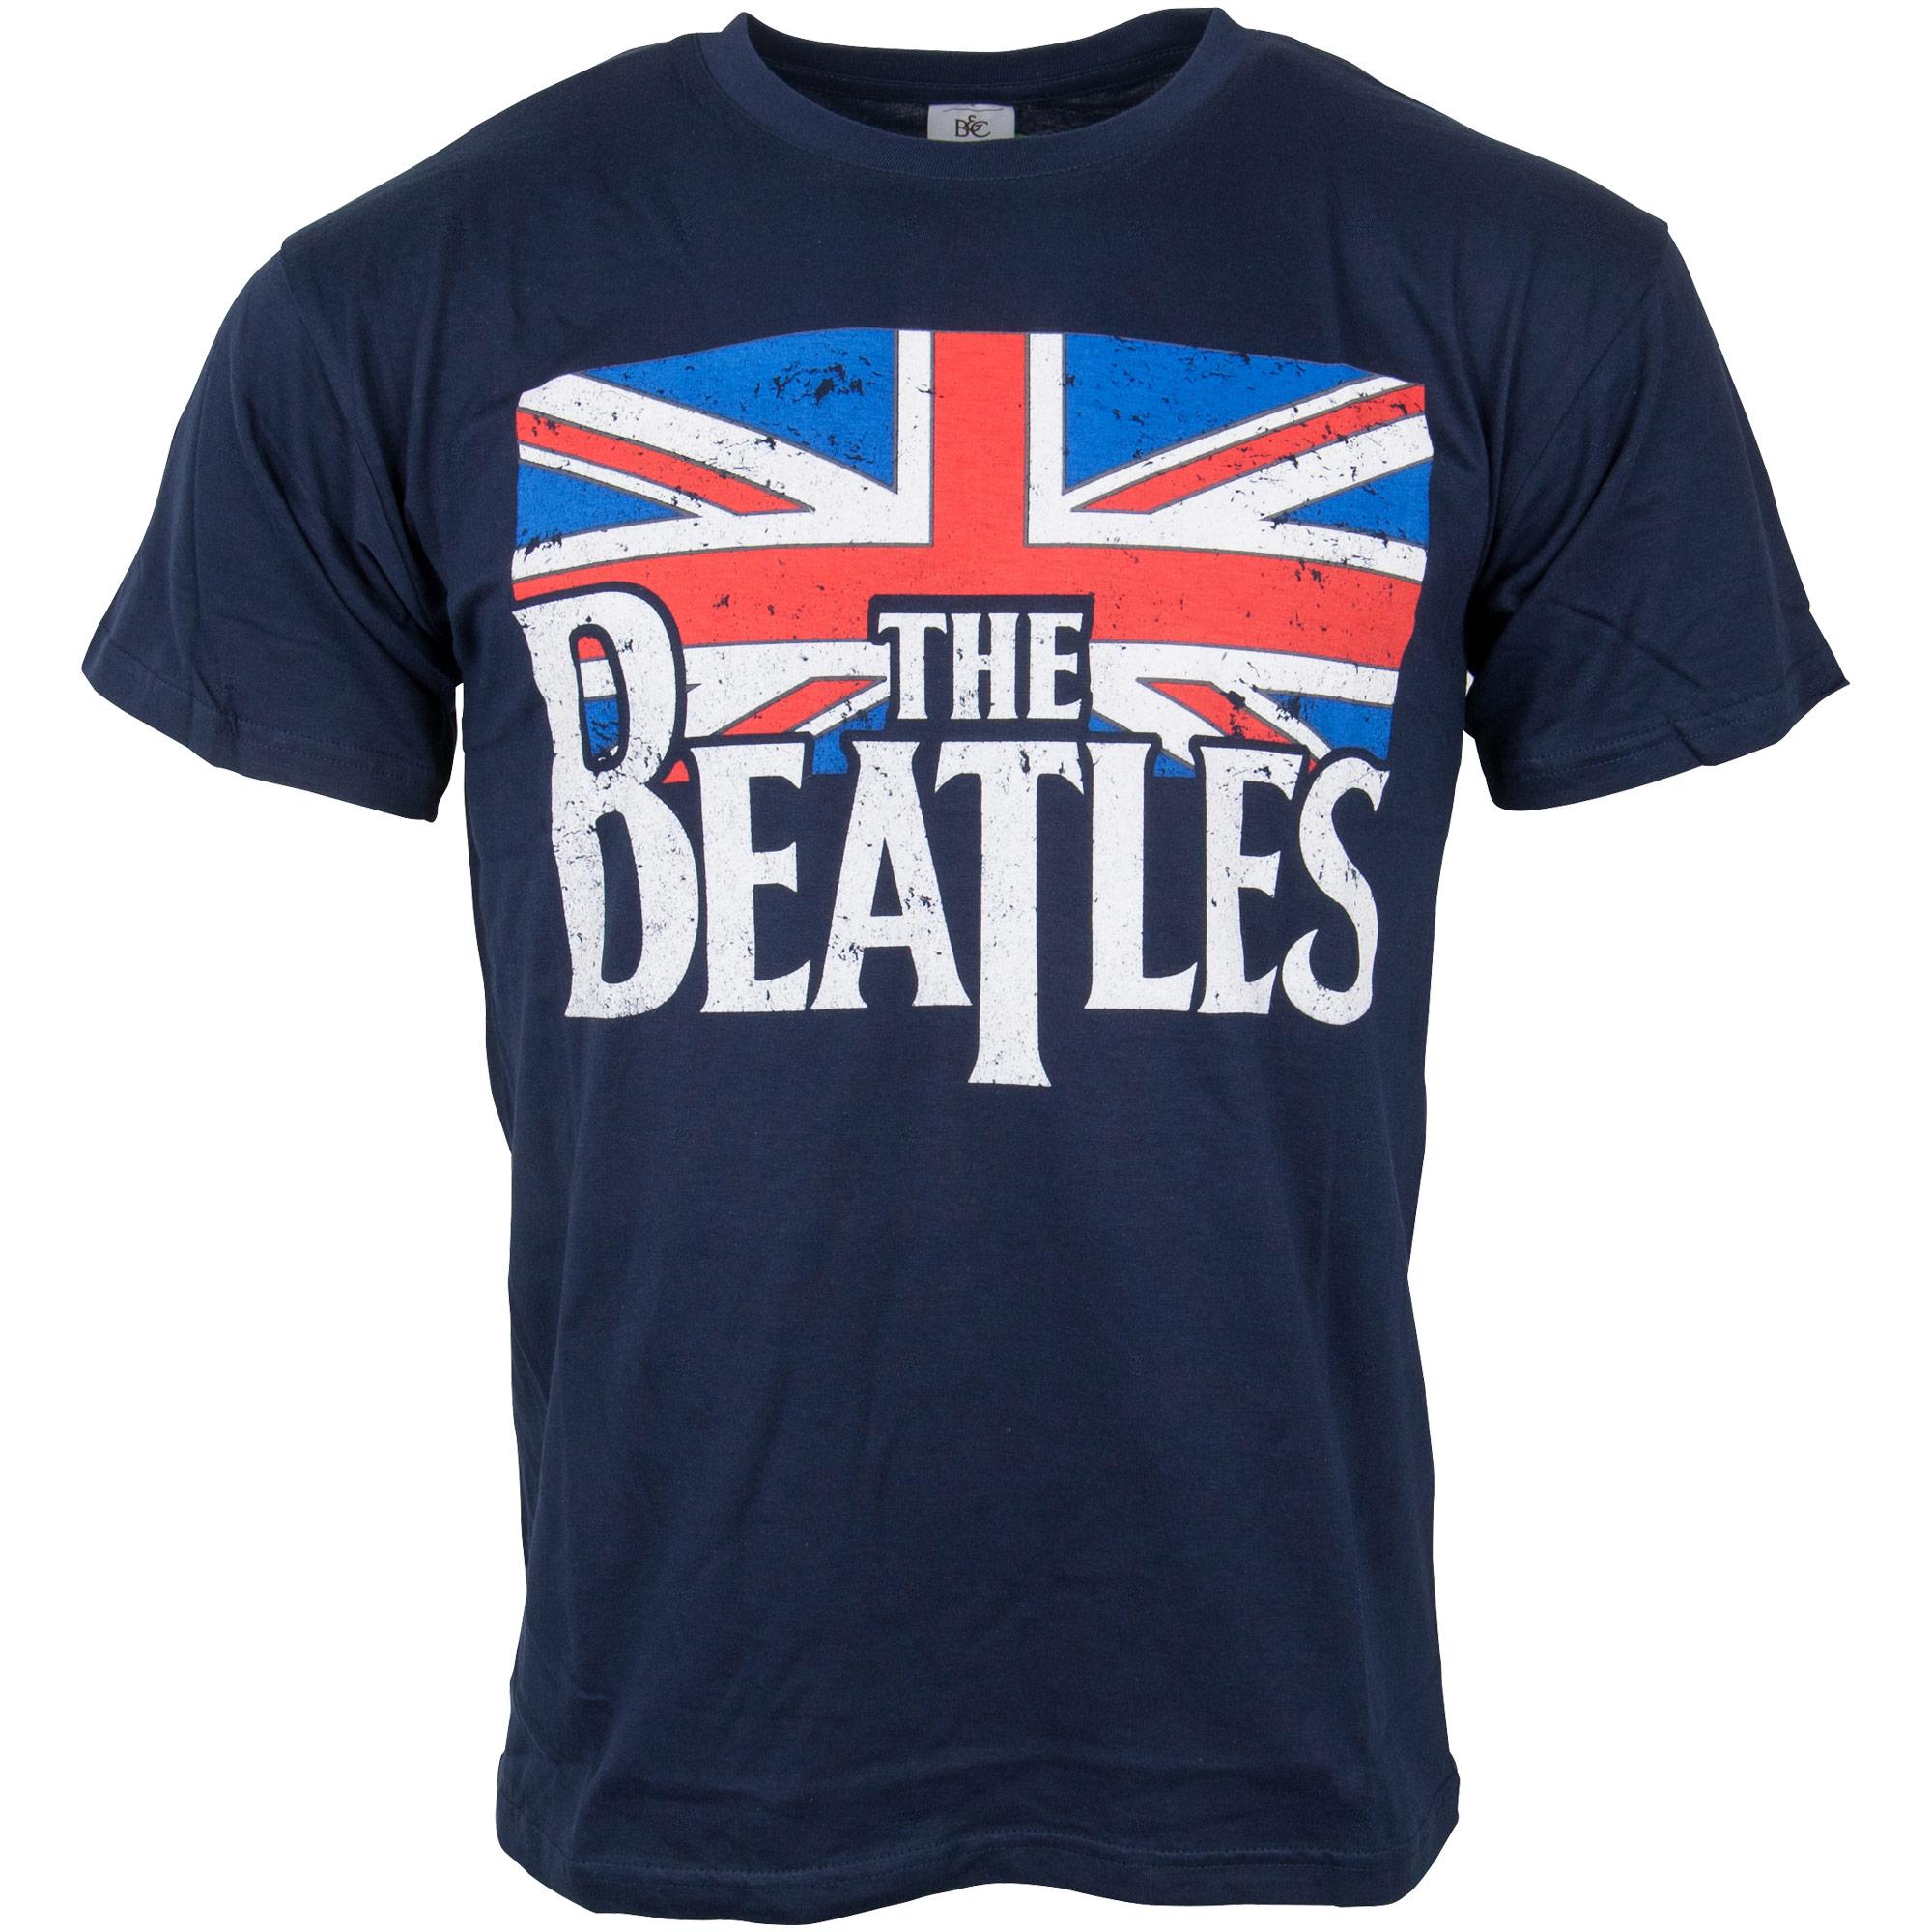 The Beatles - T-Shirt Drop T Logo & Vintage Flag - blau